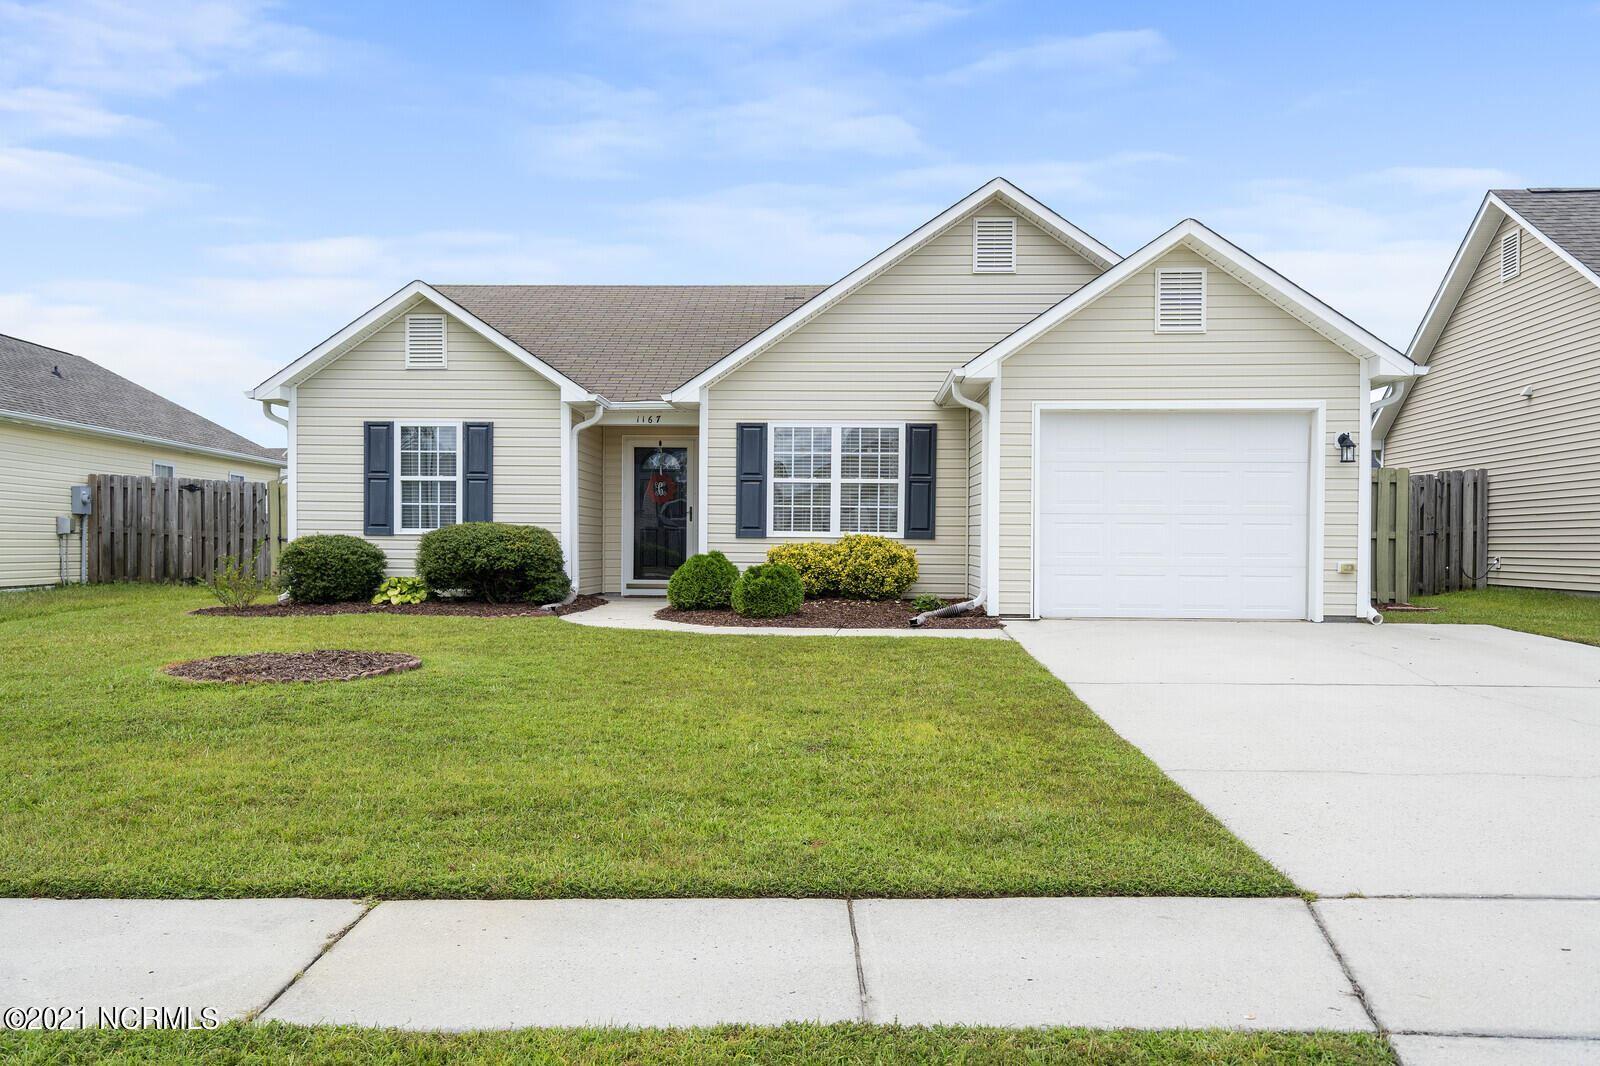 Photo of 1167 Amber Pines Drive, Leland, NC 28451 (MLS # 100292119)